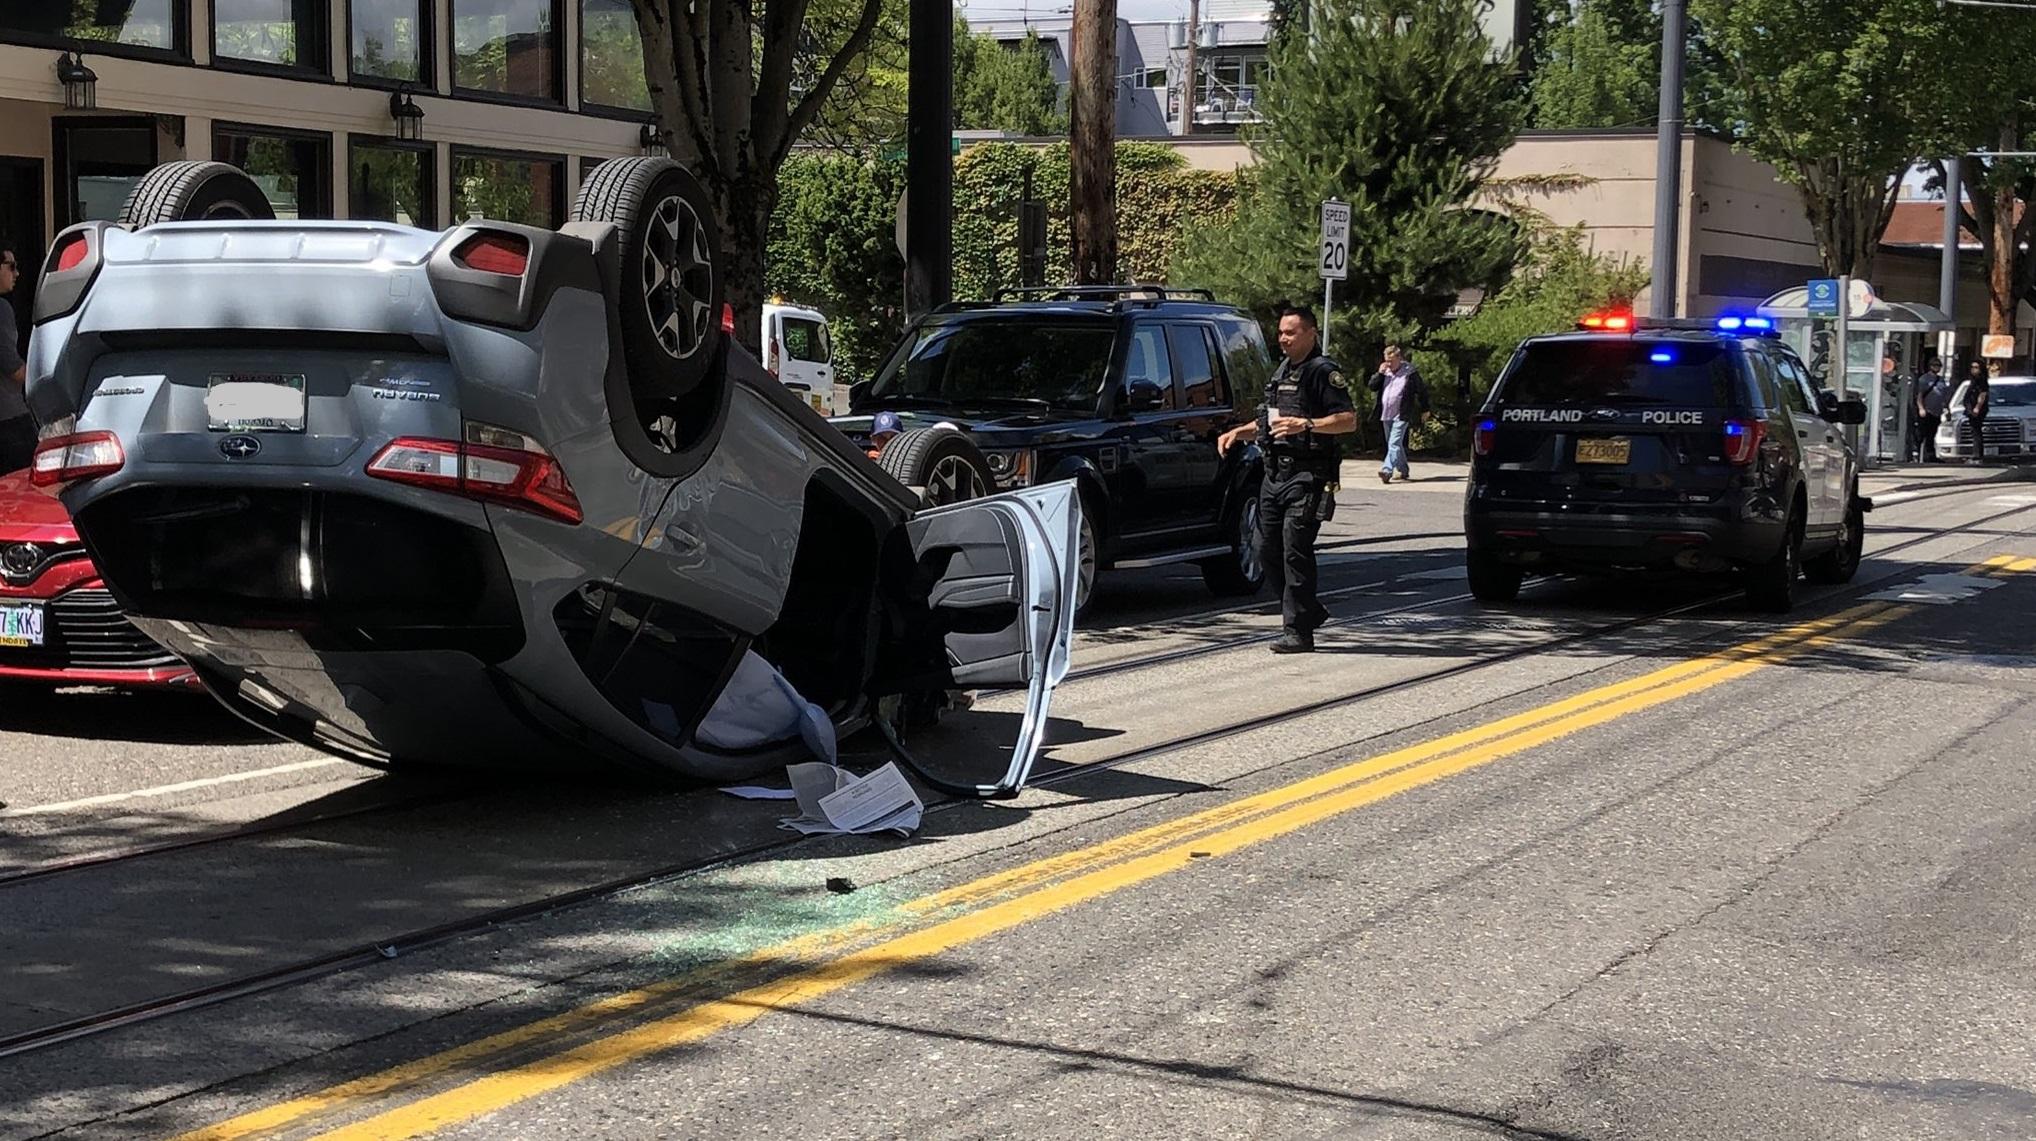 NW car flipped_1561240987859.jpg.jpg